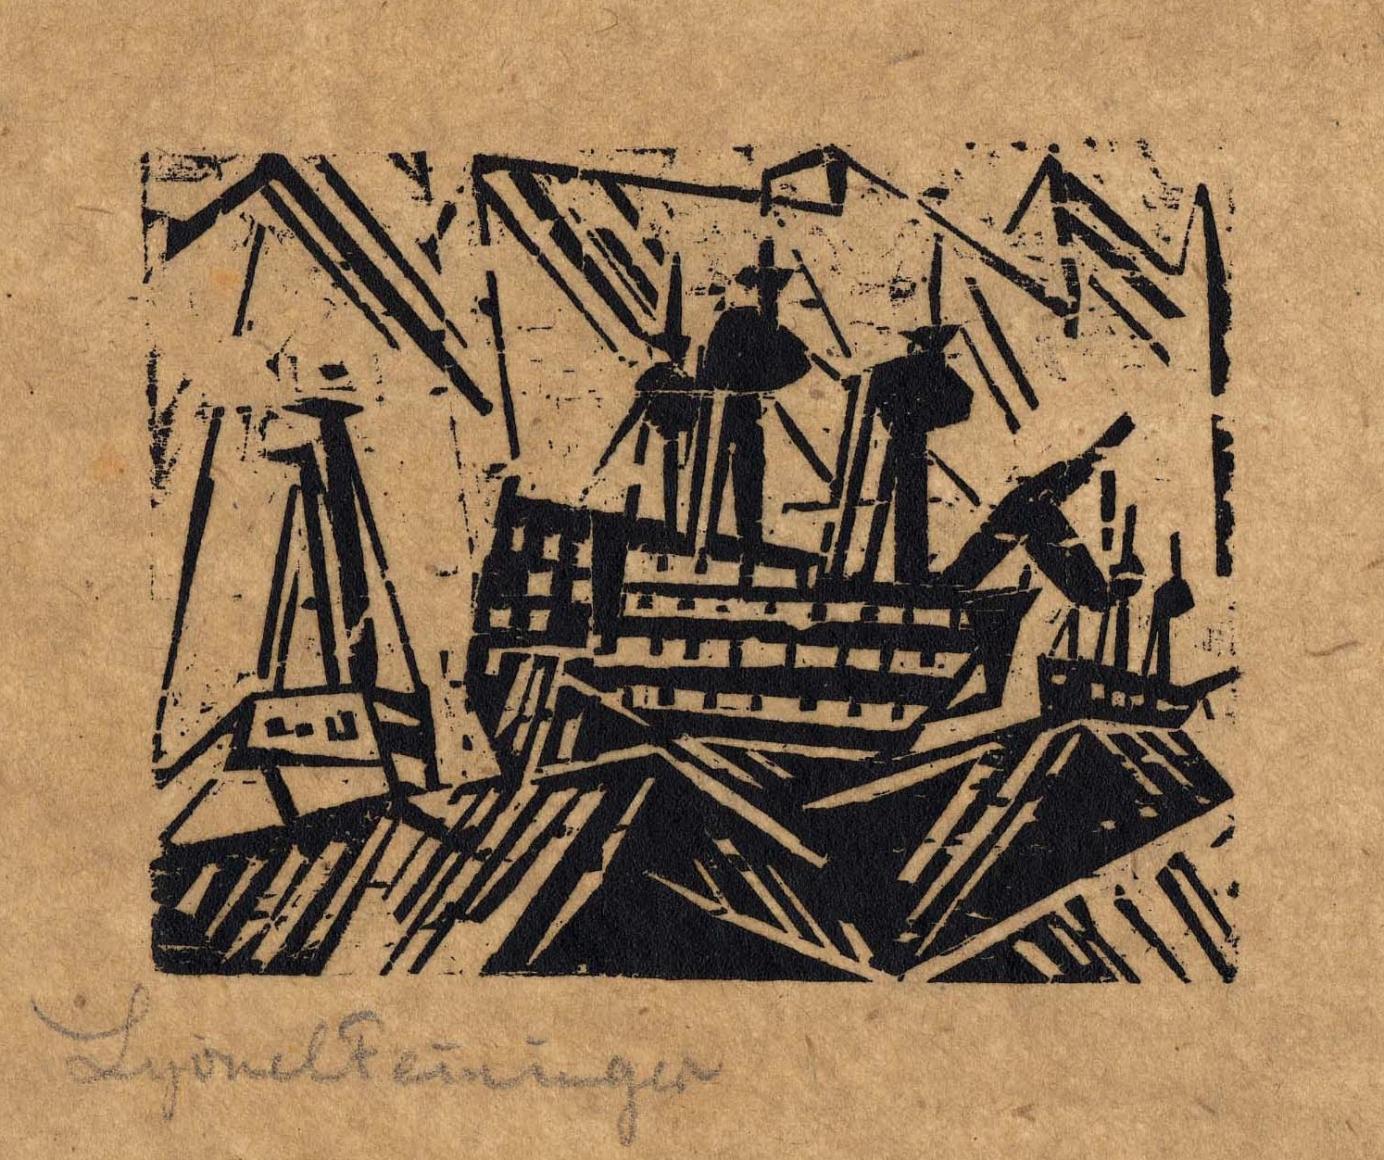 Marine woodcut by Lyonel Feininger